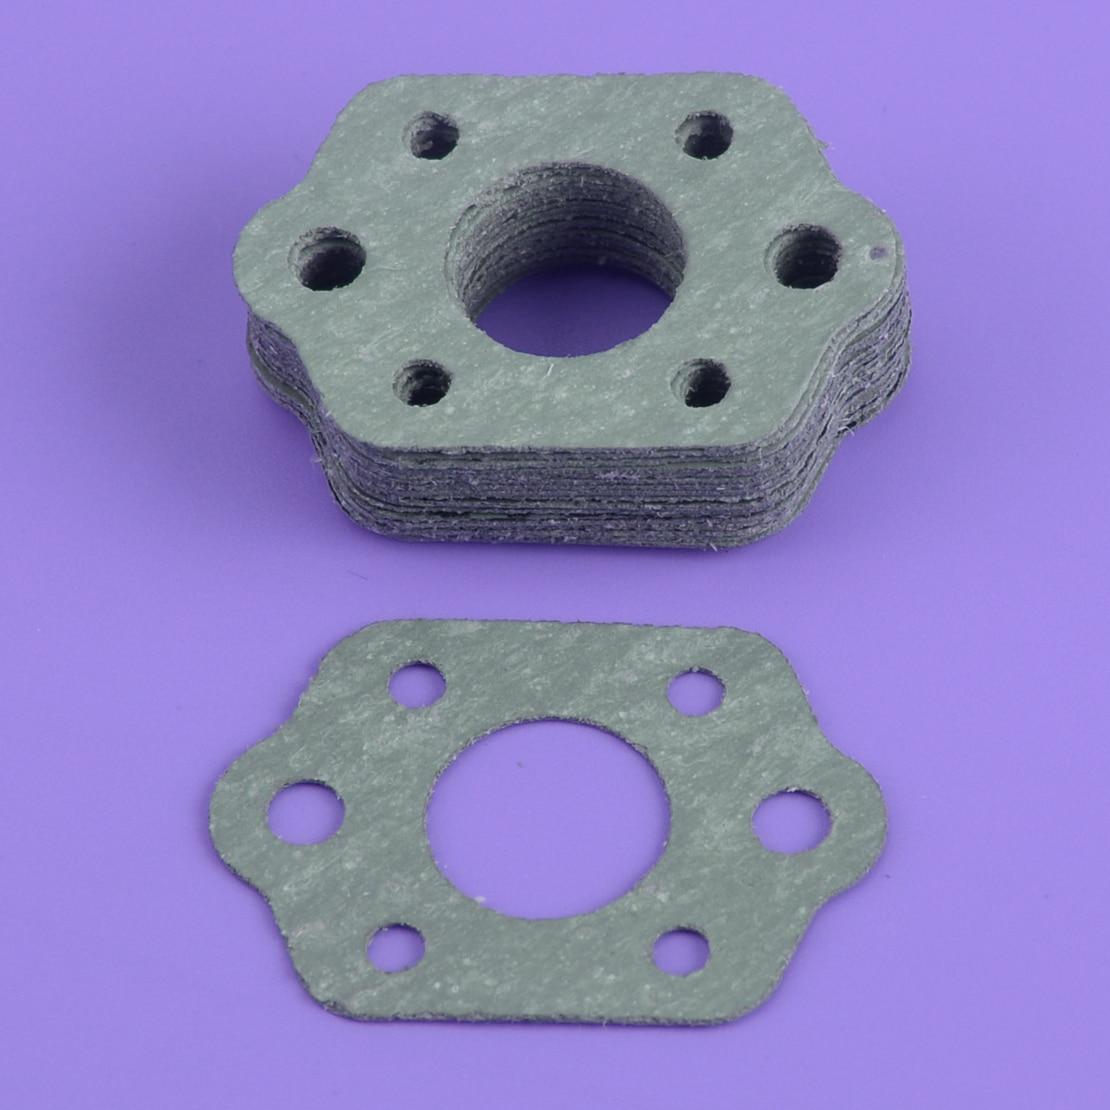 LETAOSK Grey 20pcs Carburetor Intake Manifold Carb Gasket Fit For Stihl 021 023 025 MS210C MS230C MS250C Chainsaw